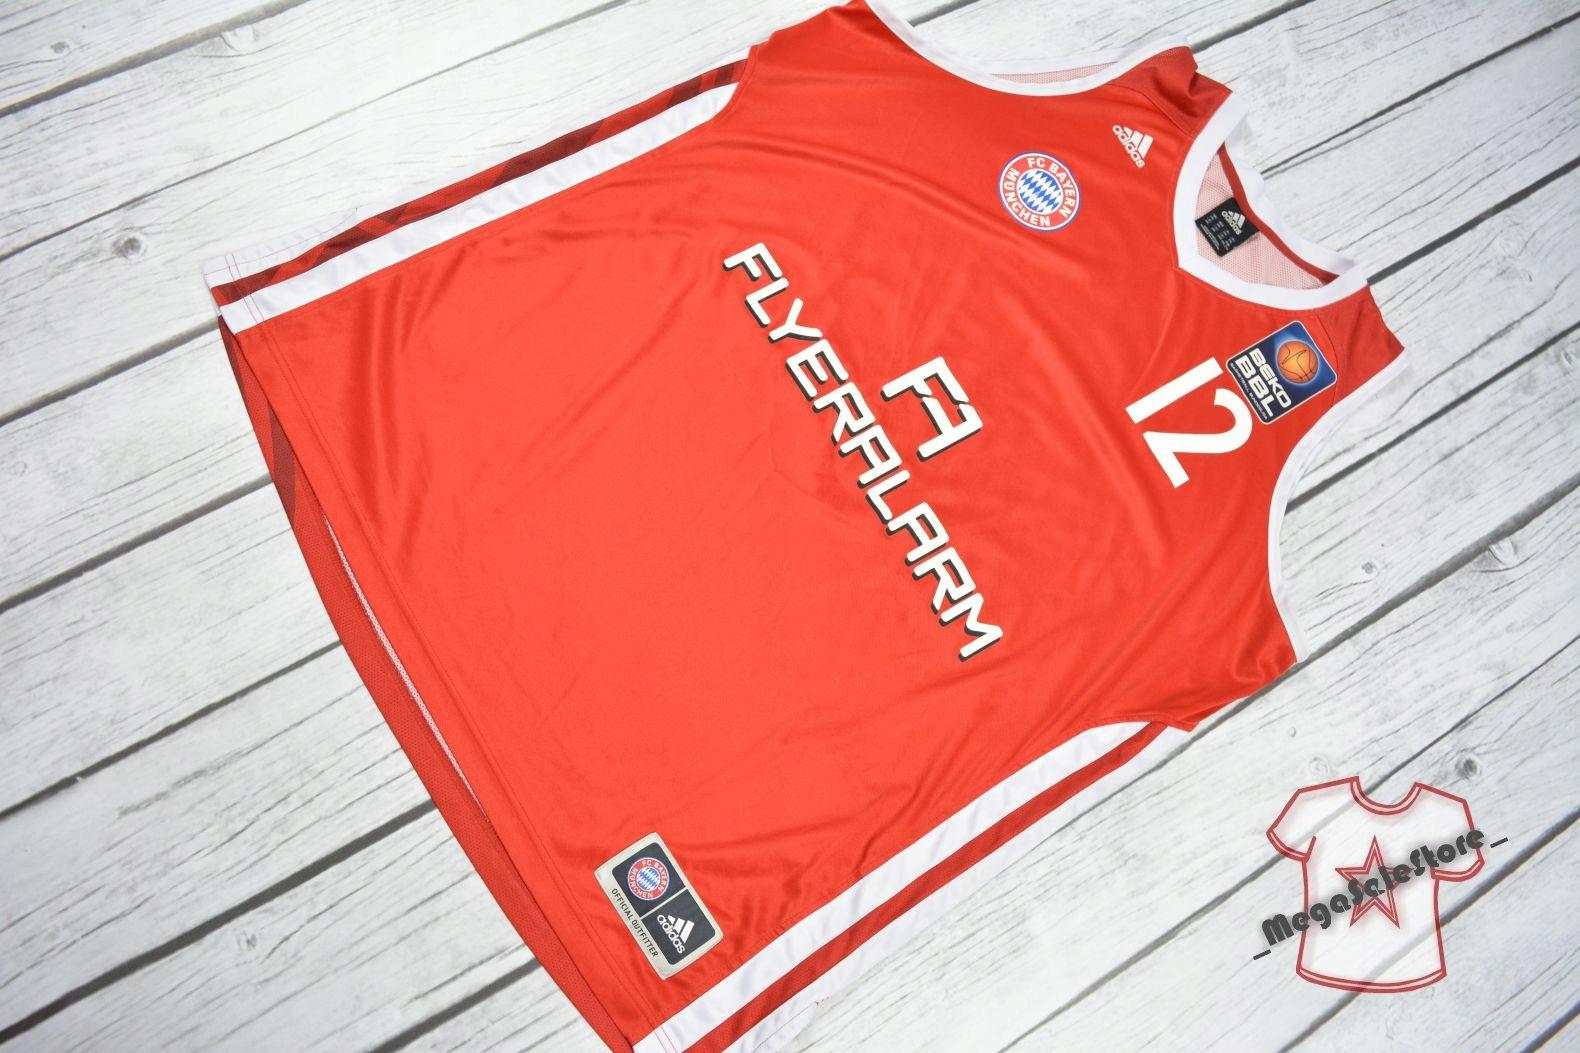 ADIDAS BAYERN MUNCHEN NBA BASKETBALL_Rozmiar 2XL